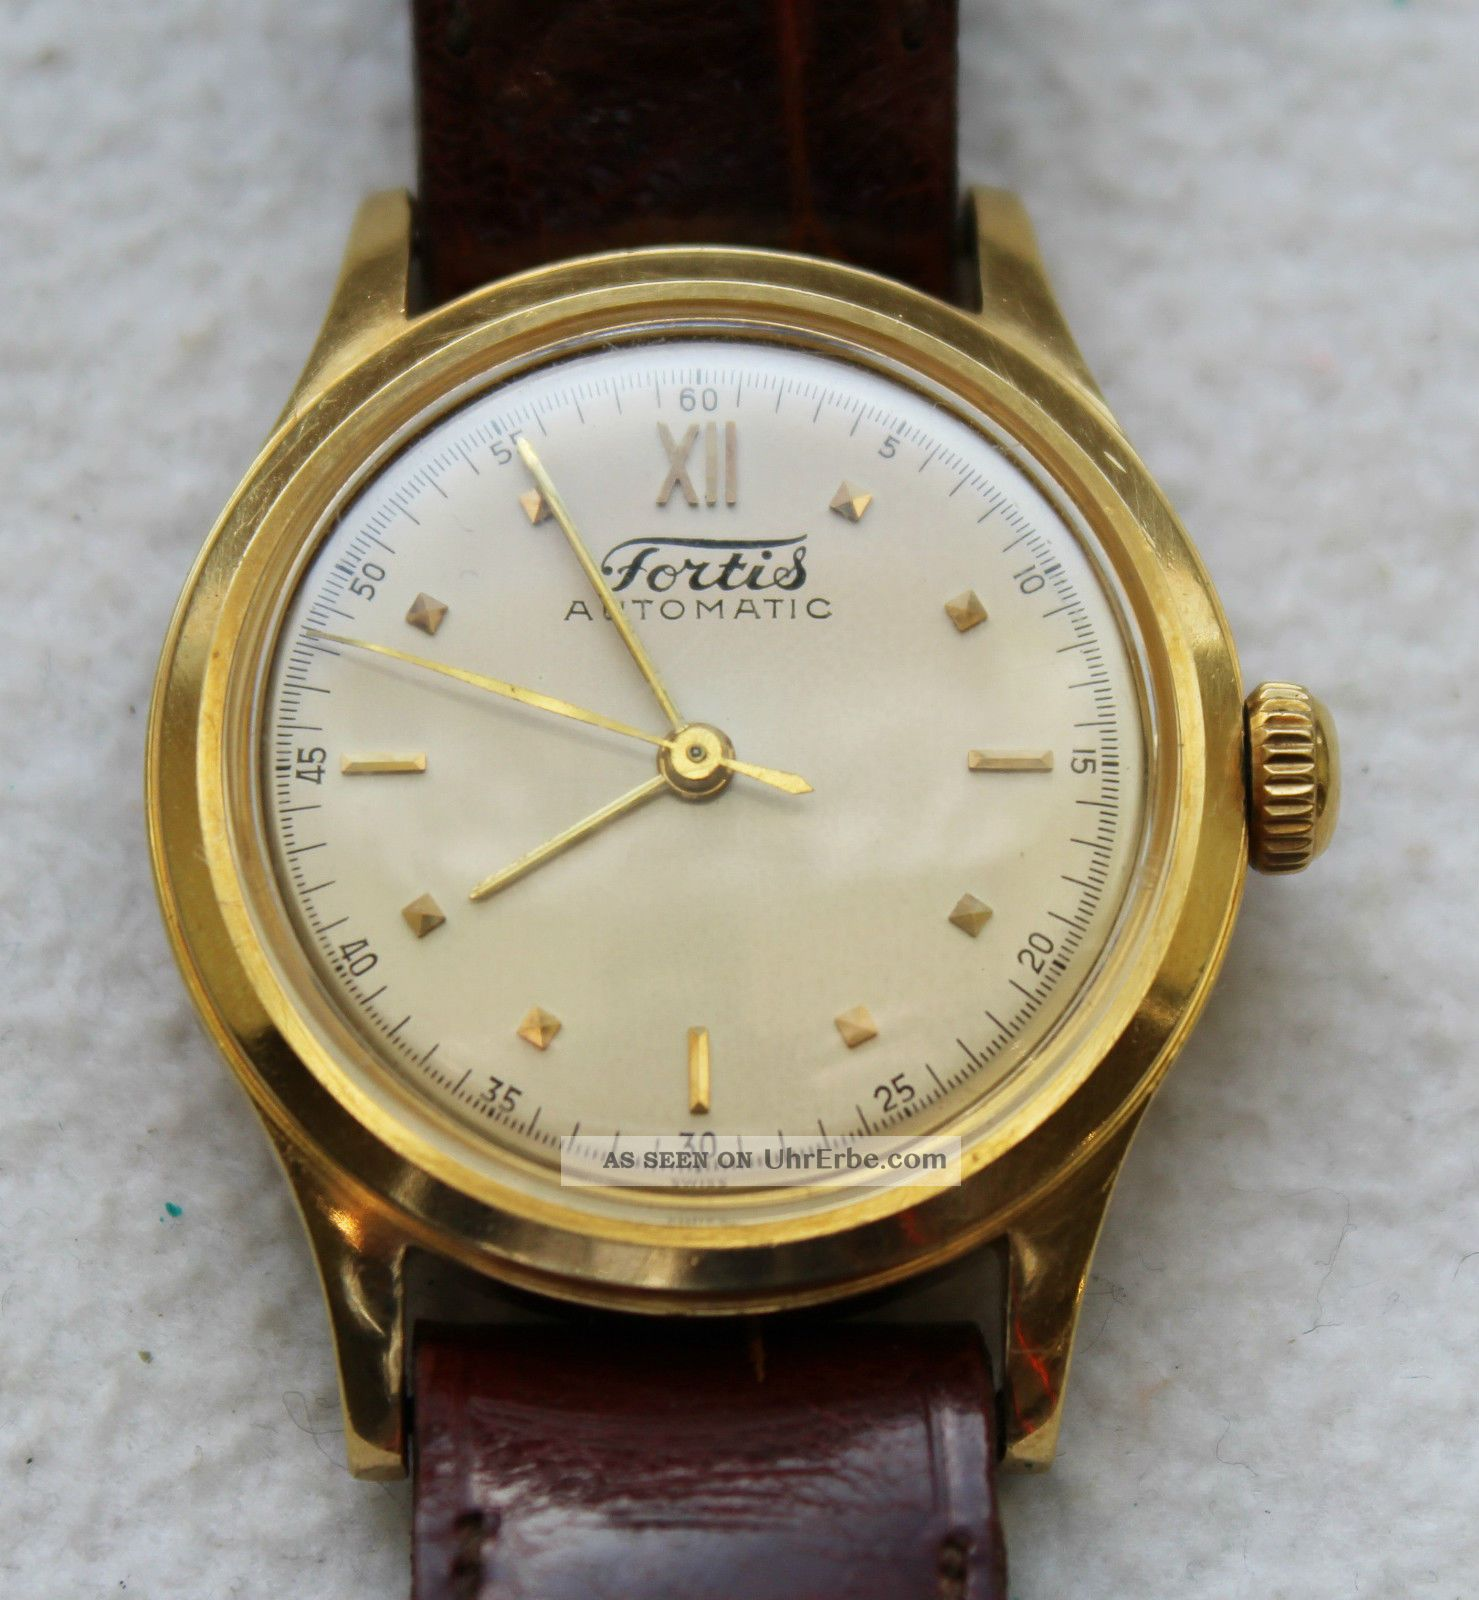 Vintage Fortis Automatic 18k Gold Armbanduhr. Armbanduhren Bild